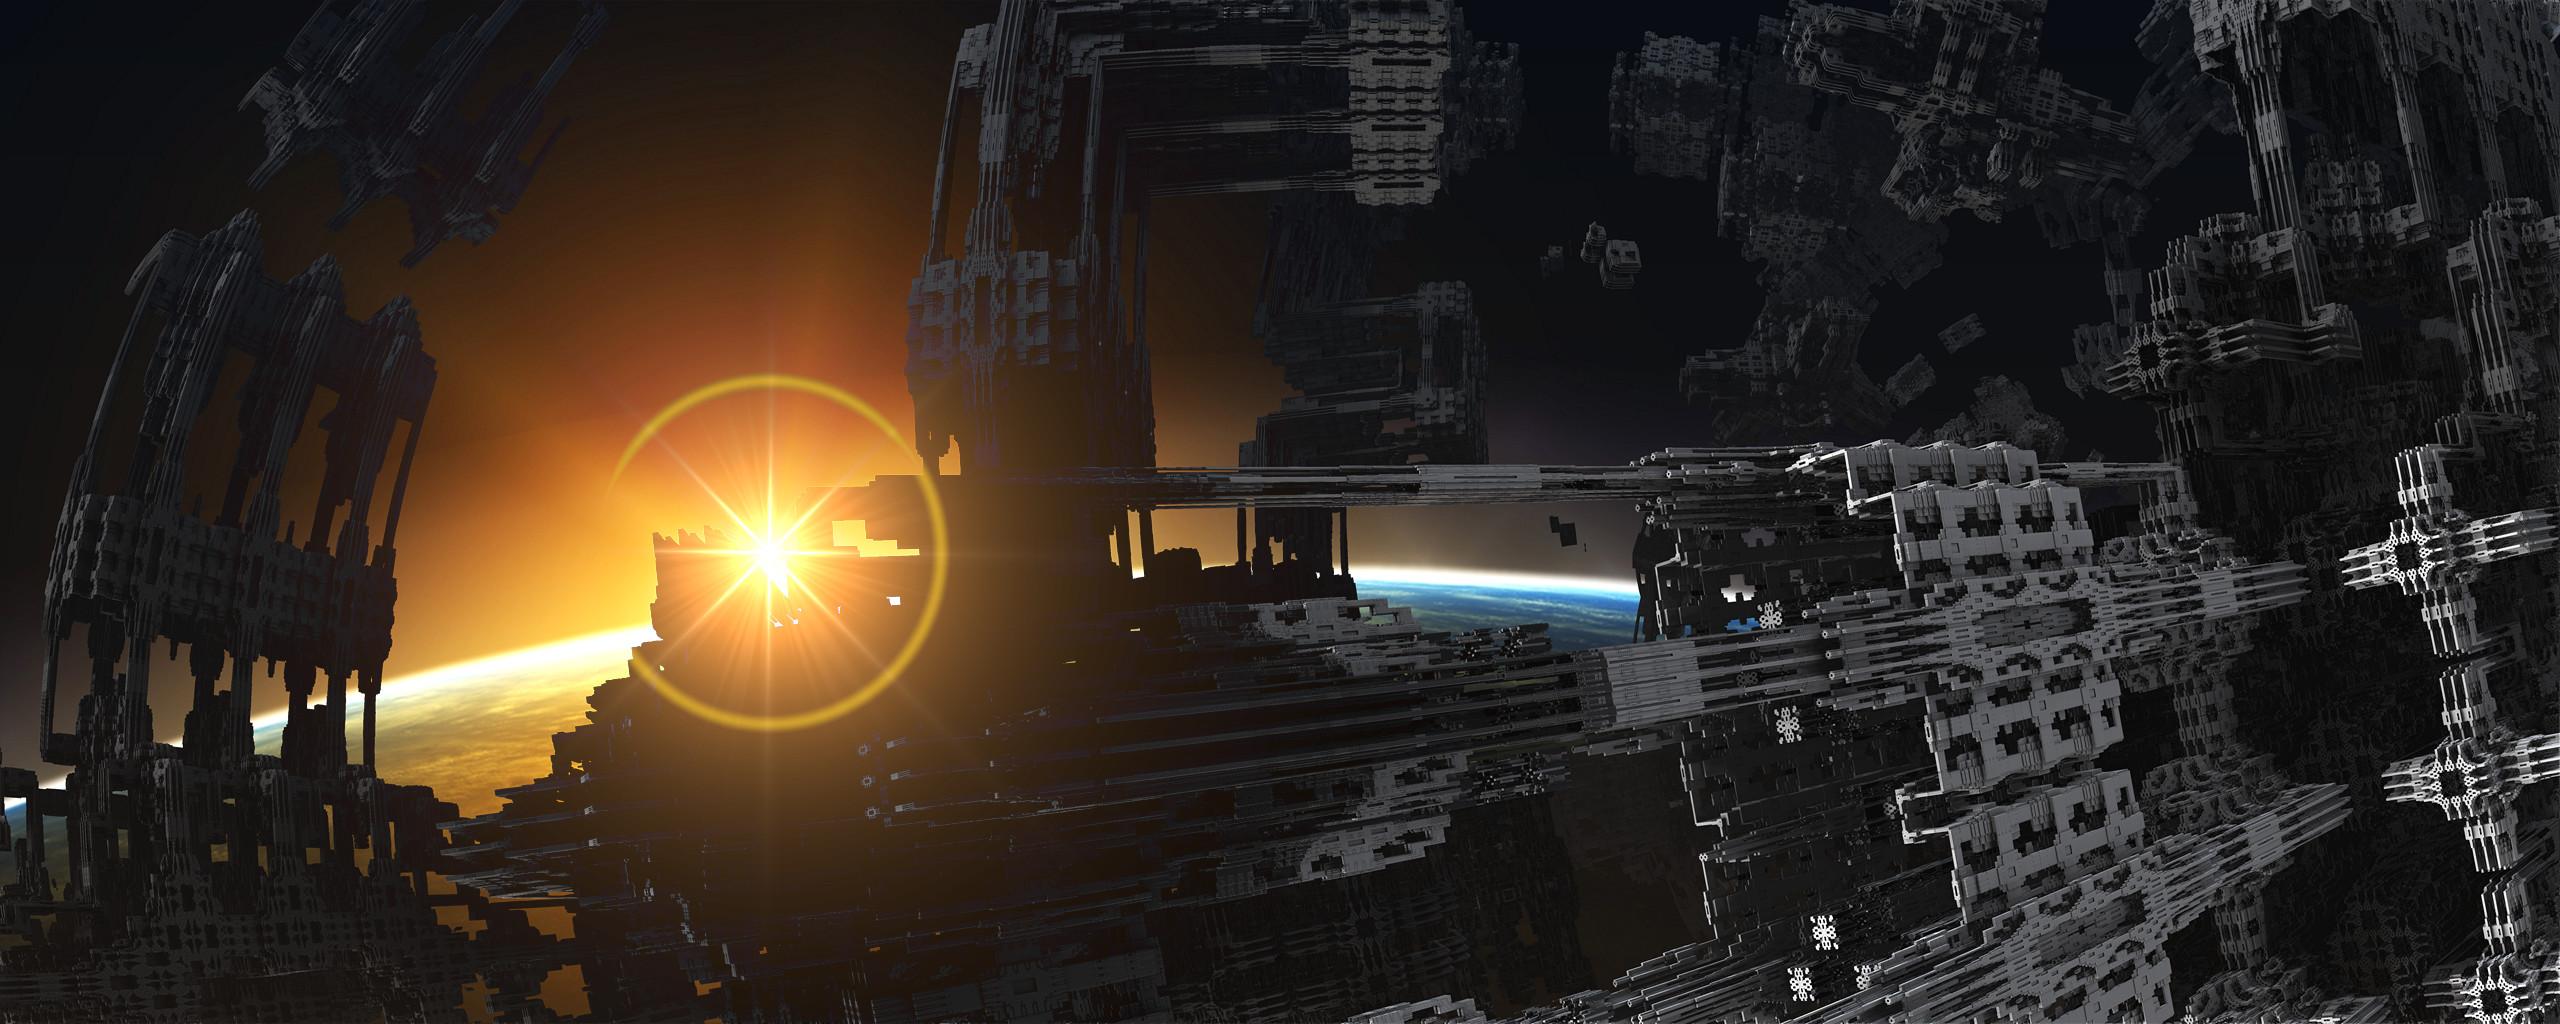 Dual Display Fractal Sci Fi Iii By Grahamsym On Deviantart